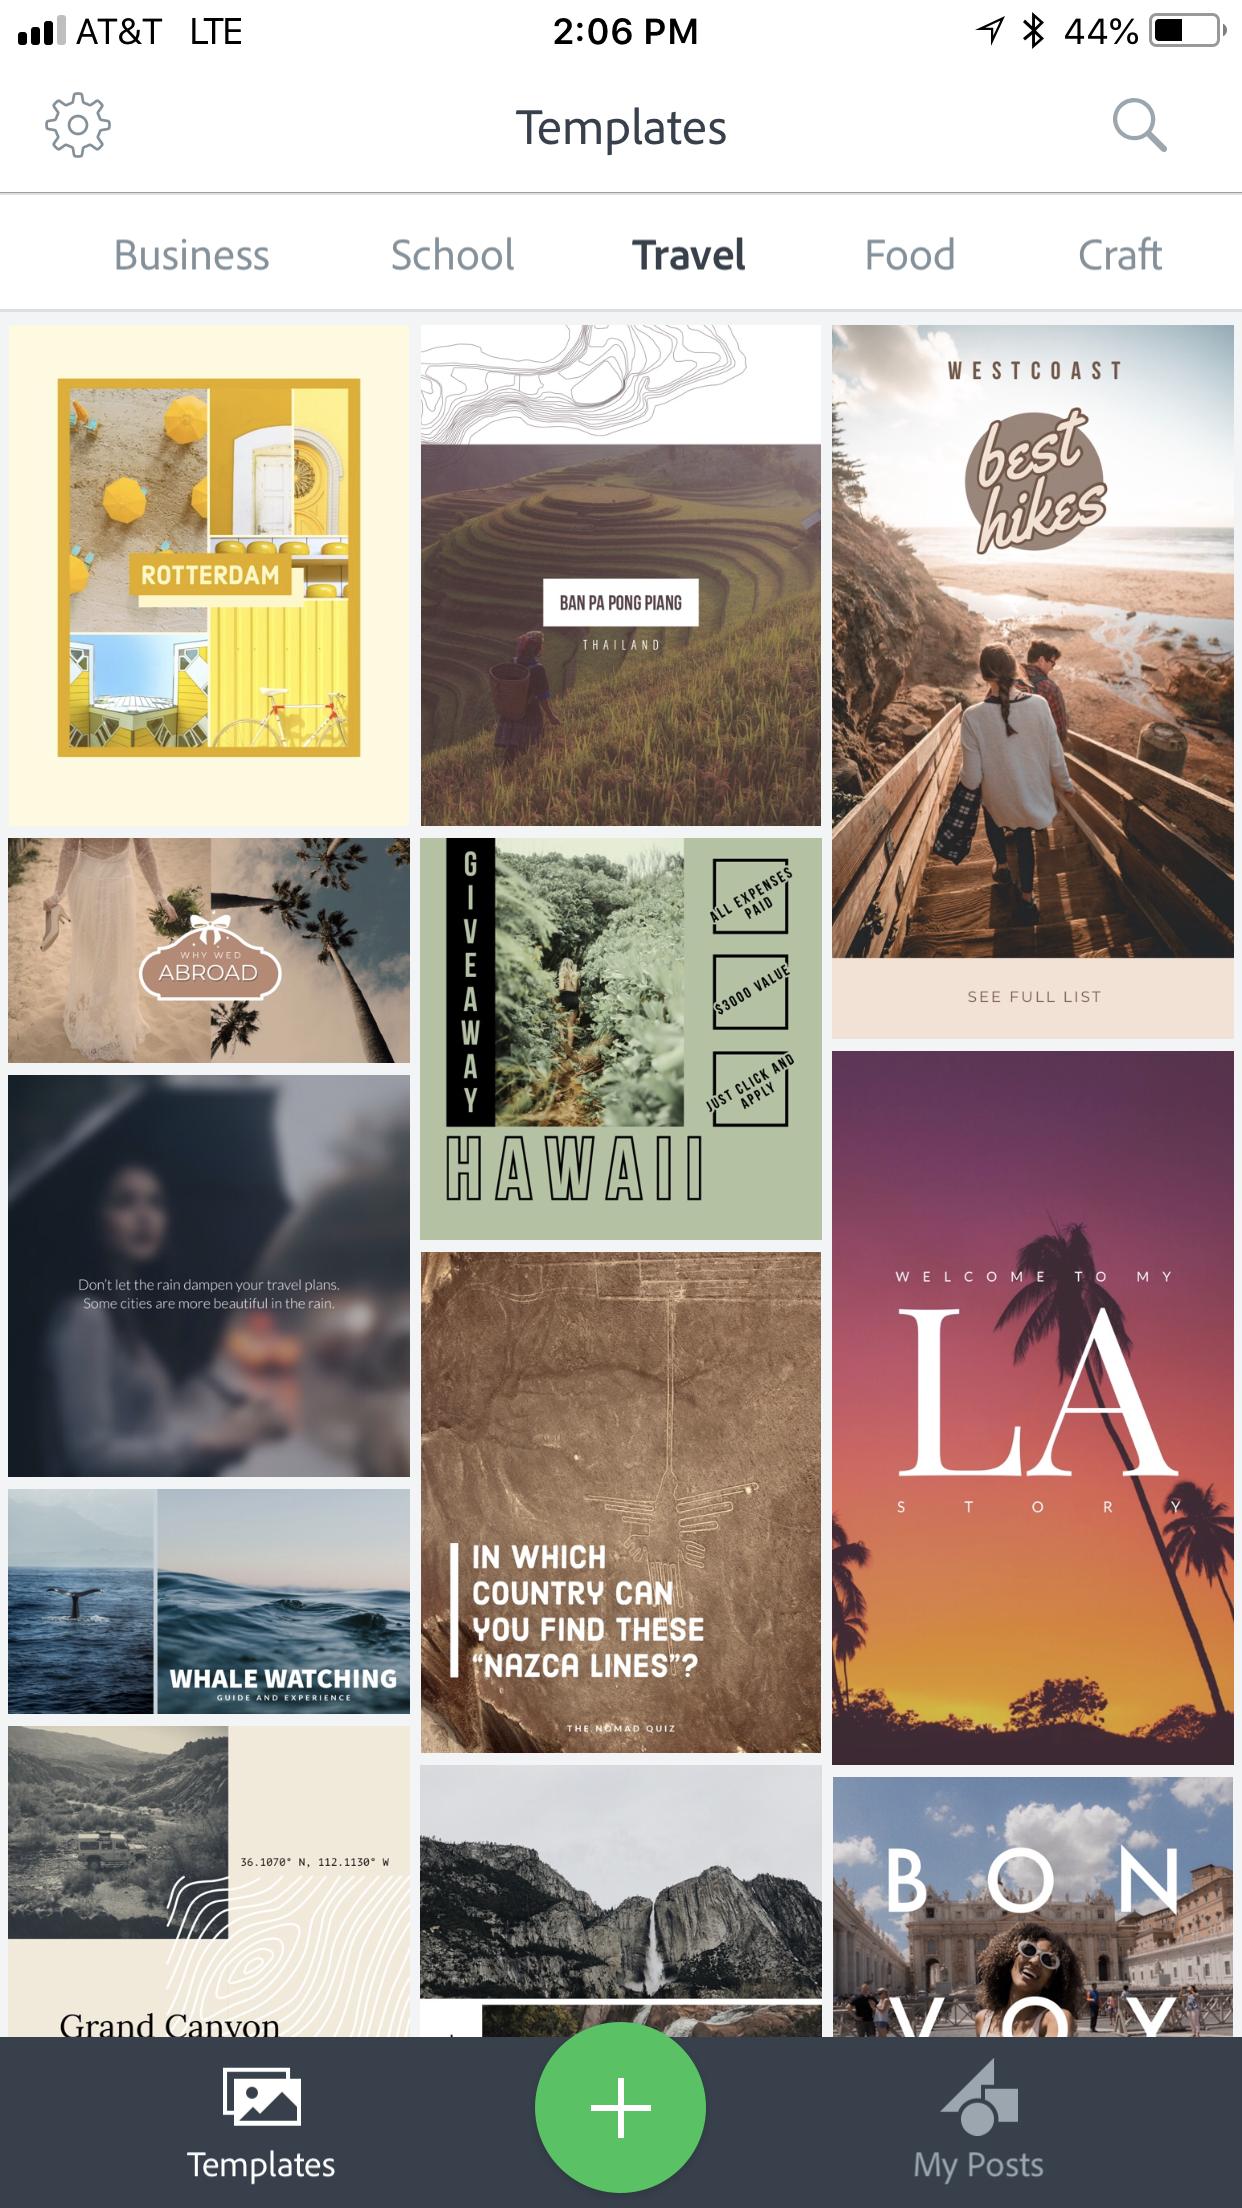 5 Apps to Create Instagram Stories - Karya Schanilec Photography